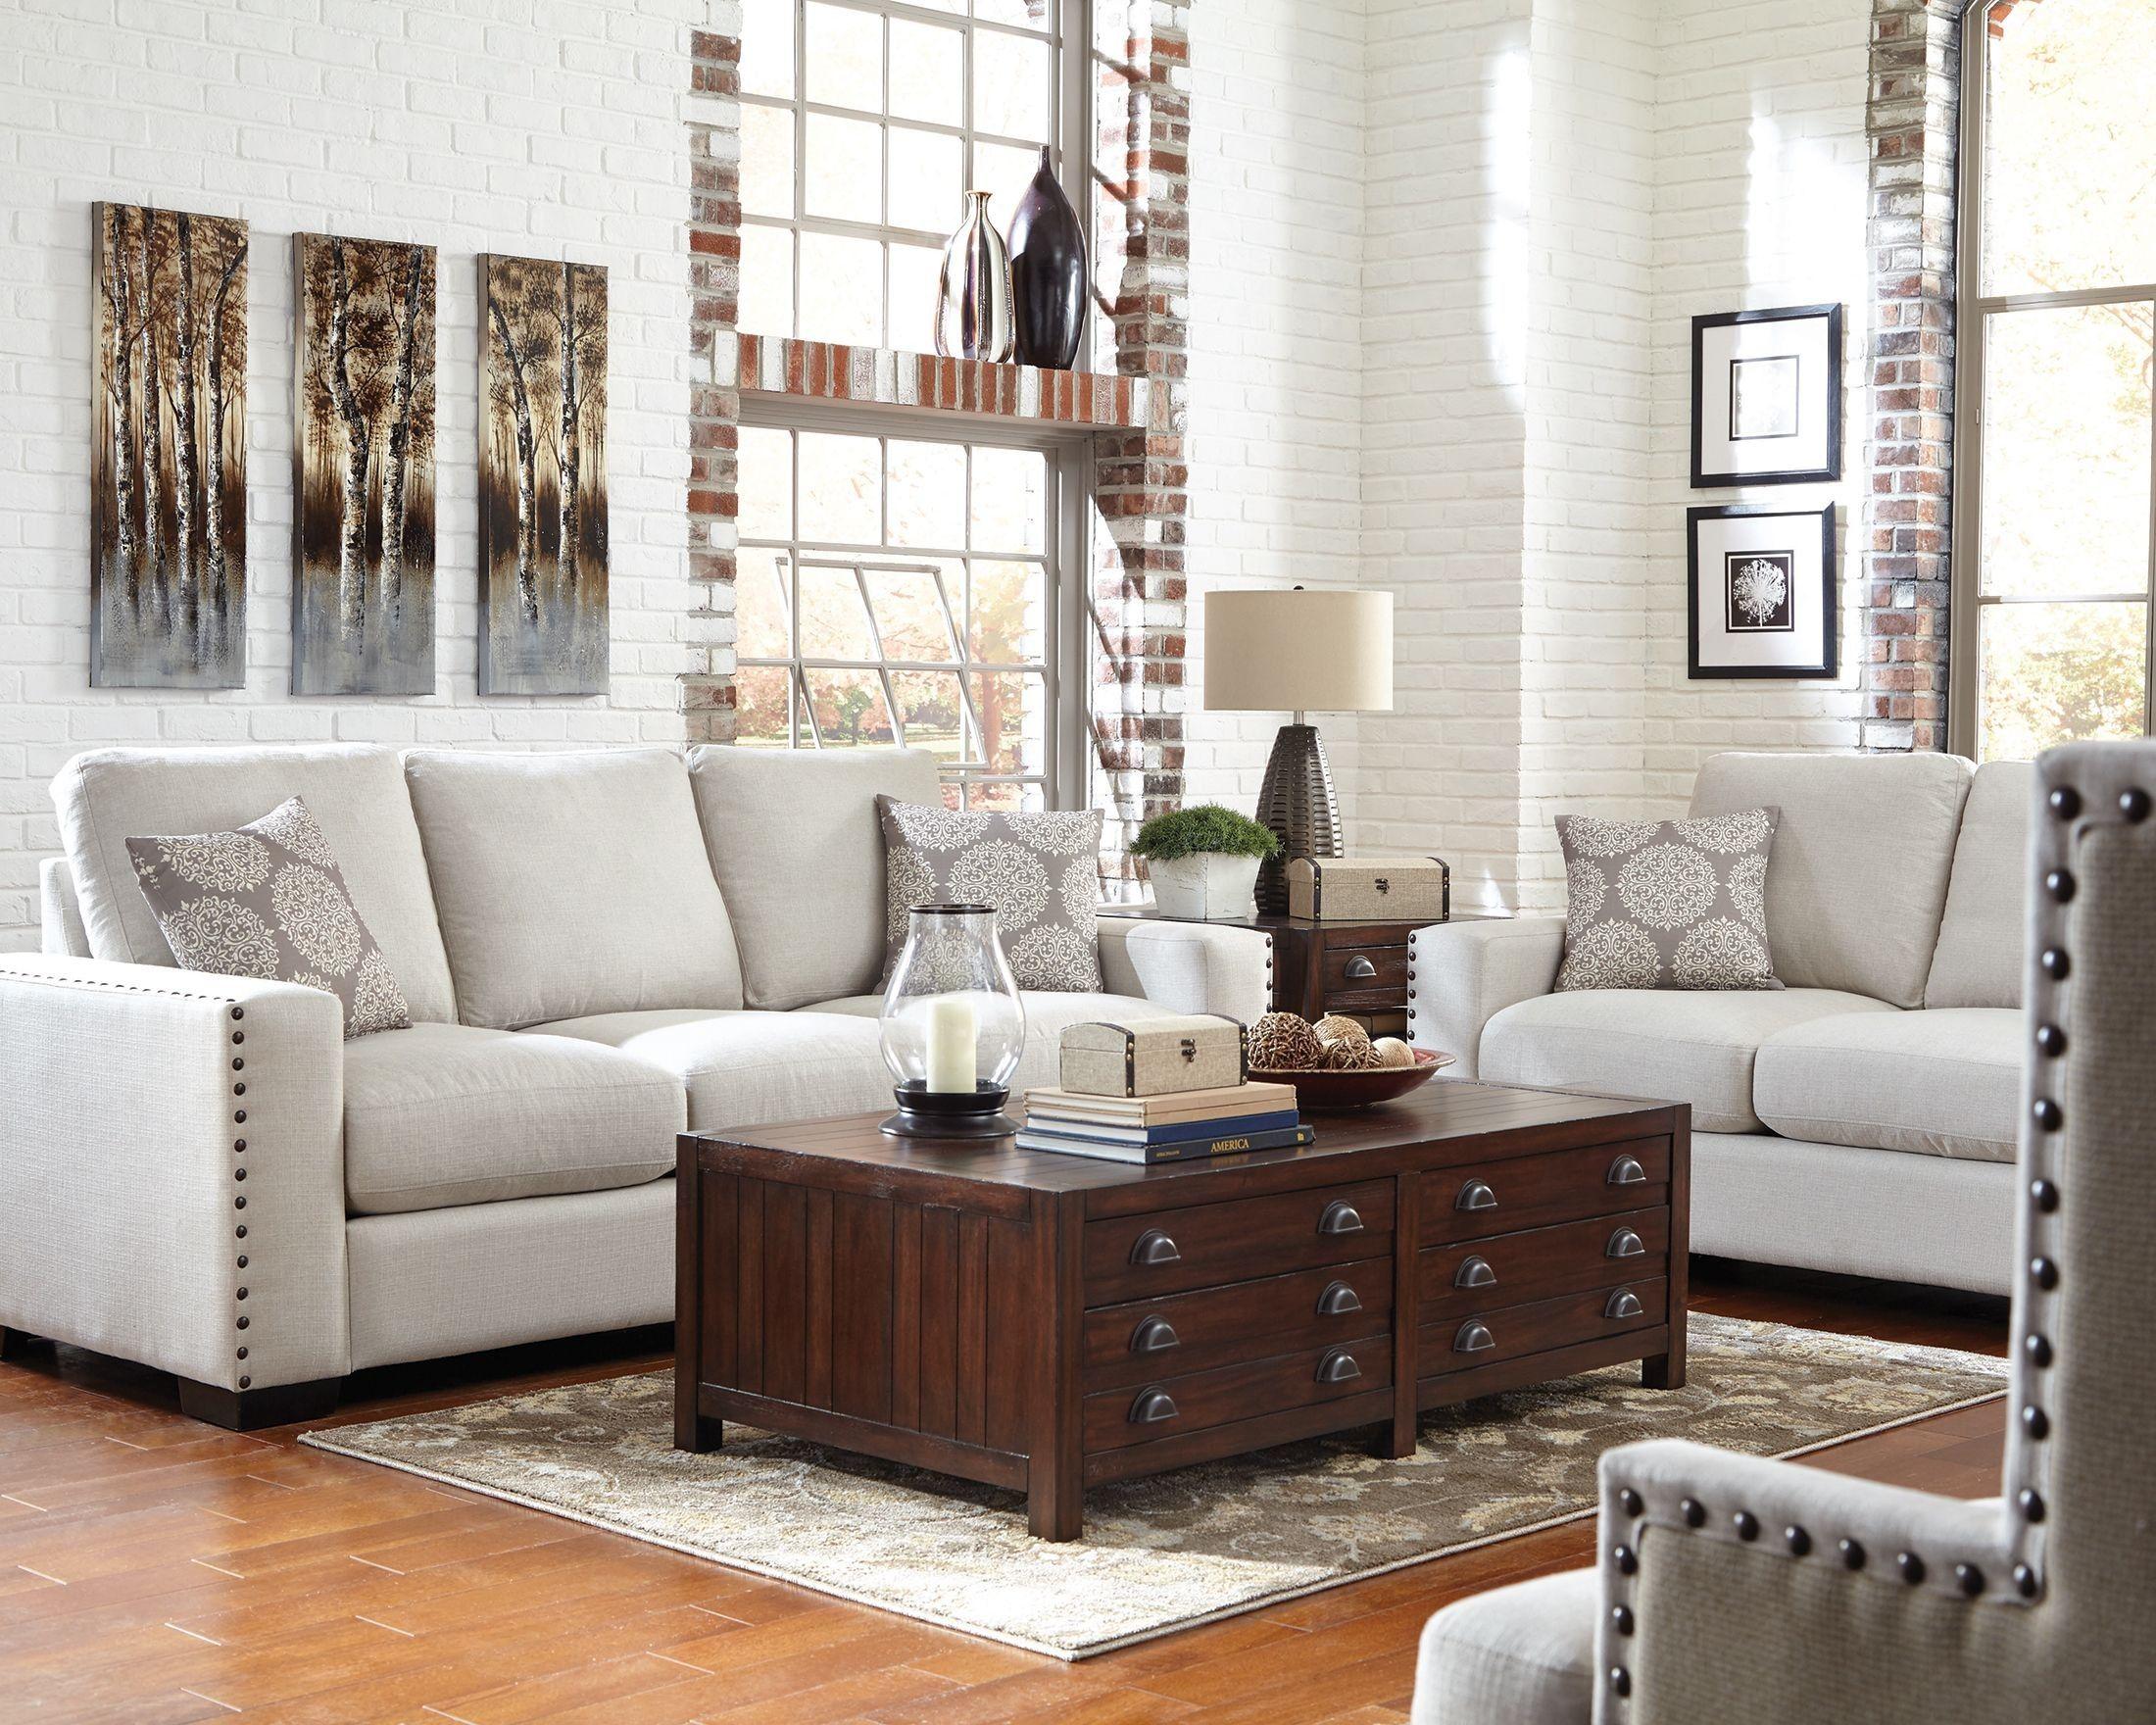 Rosanna Pewter Linen Living Room Set Living Room Sets Living Room Sets Furniture Sofa And Loveseat Set Pc living room decor set by home